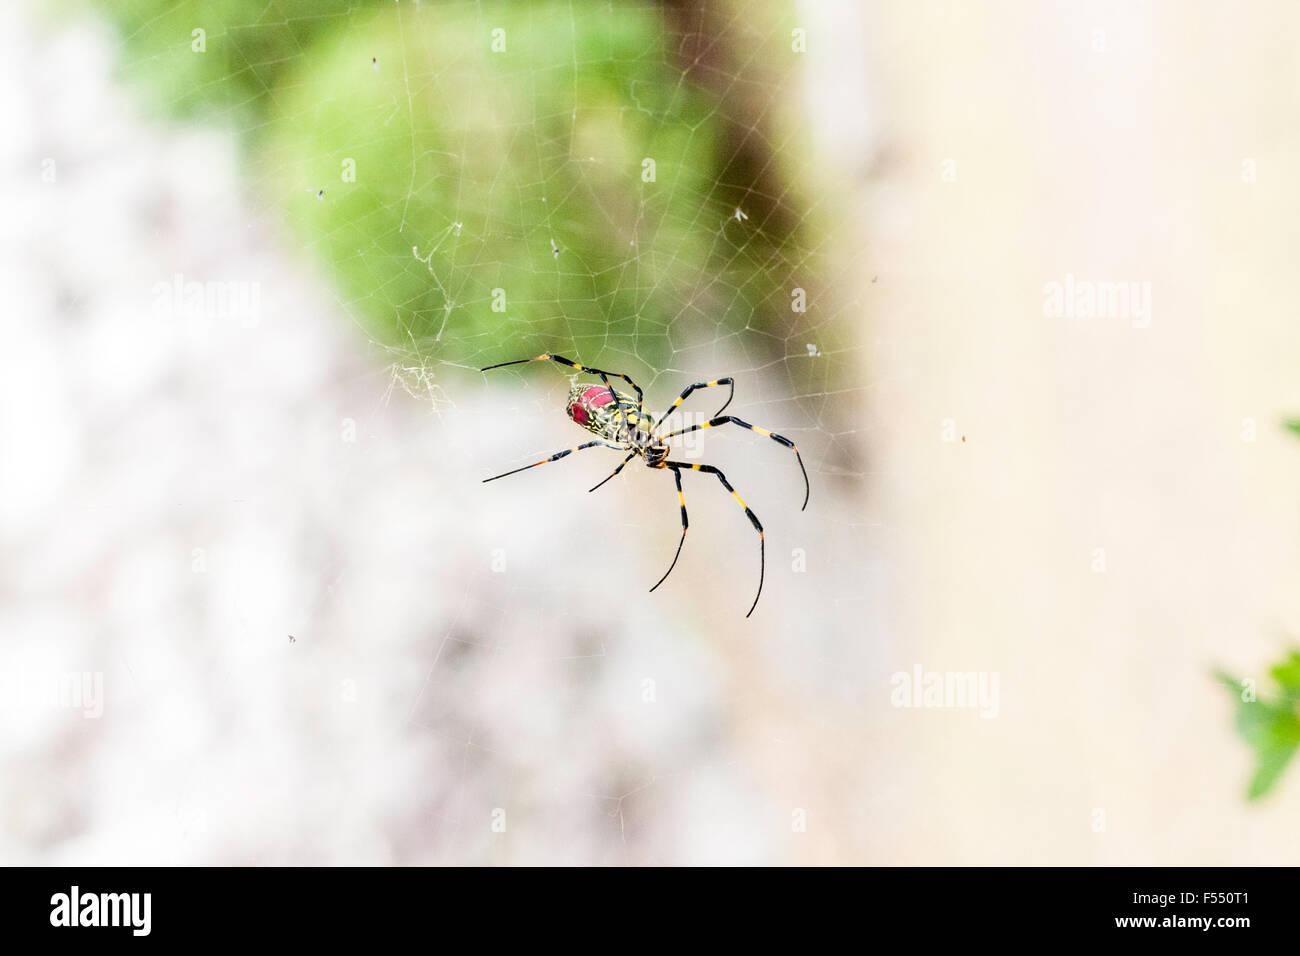 Japan. large Yellow & Red Spider. Tetragnathidae, Nephila clavata, Joro spider from the Golden orb-web spider - Stock Image